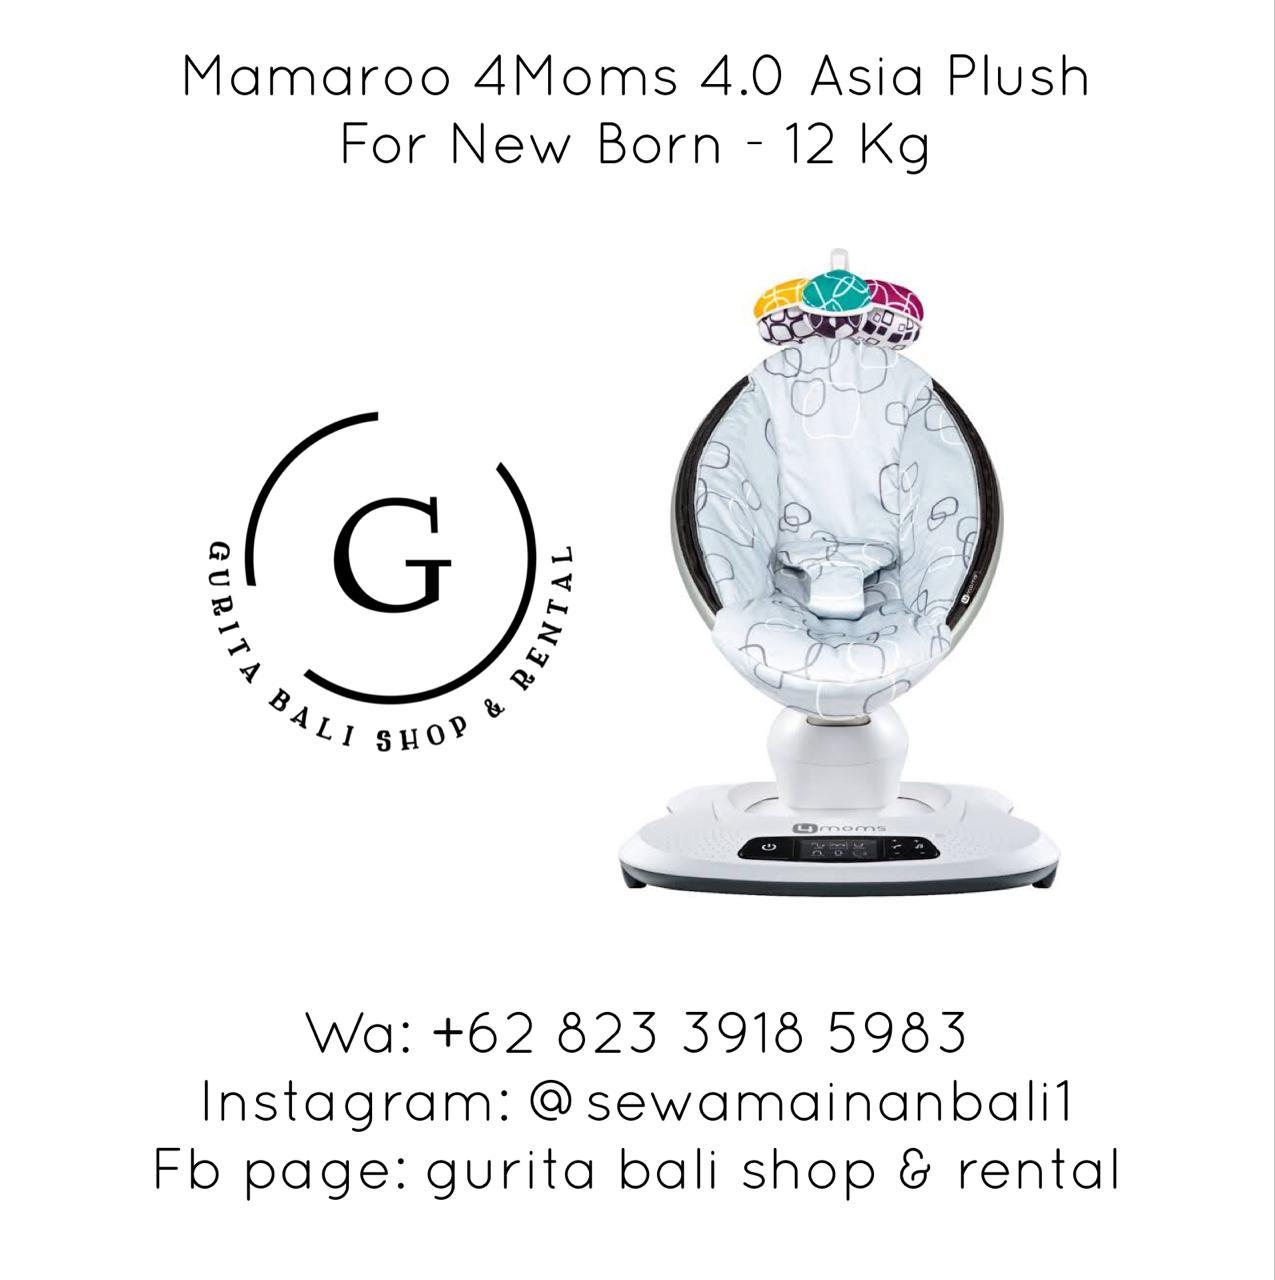 MAMAROO 4MOMS 4.0 ASIA PLUSH